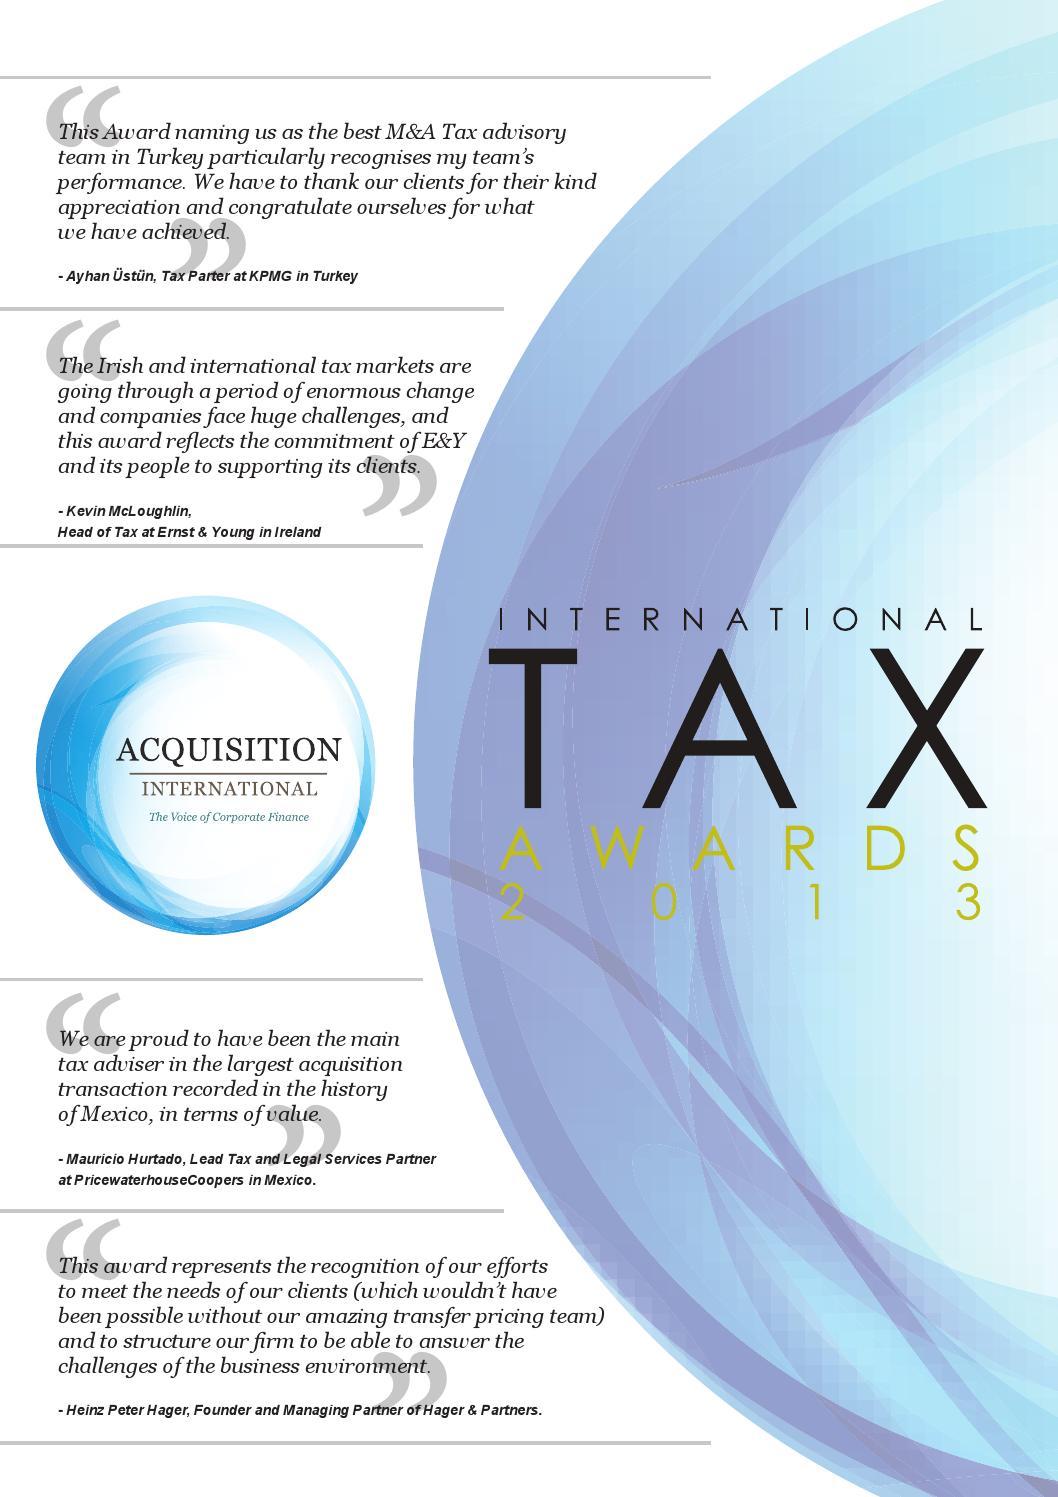 Tax awards 2013 by AI Global Media - issuu